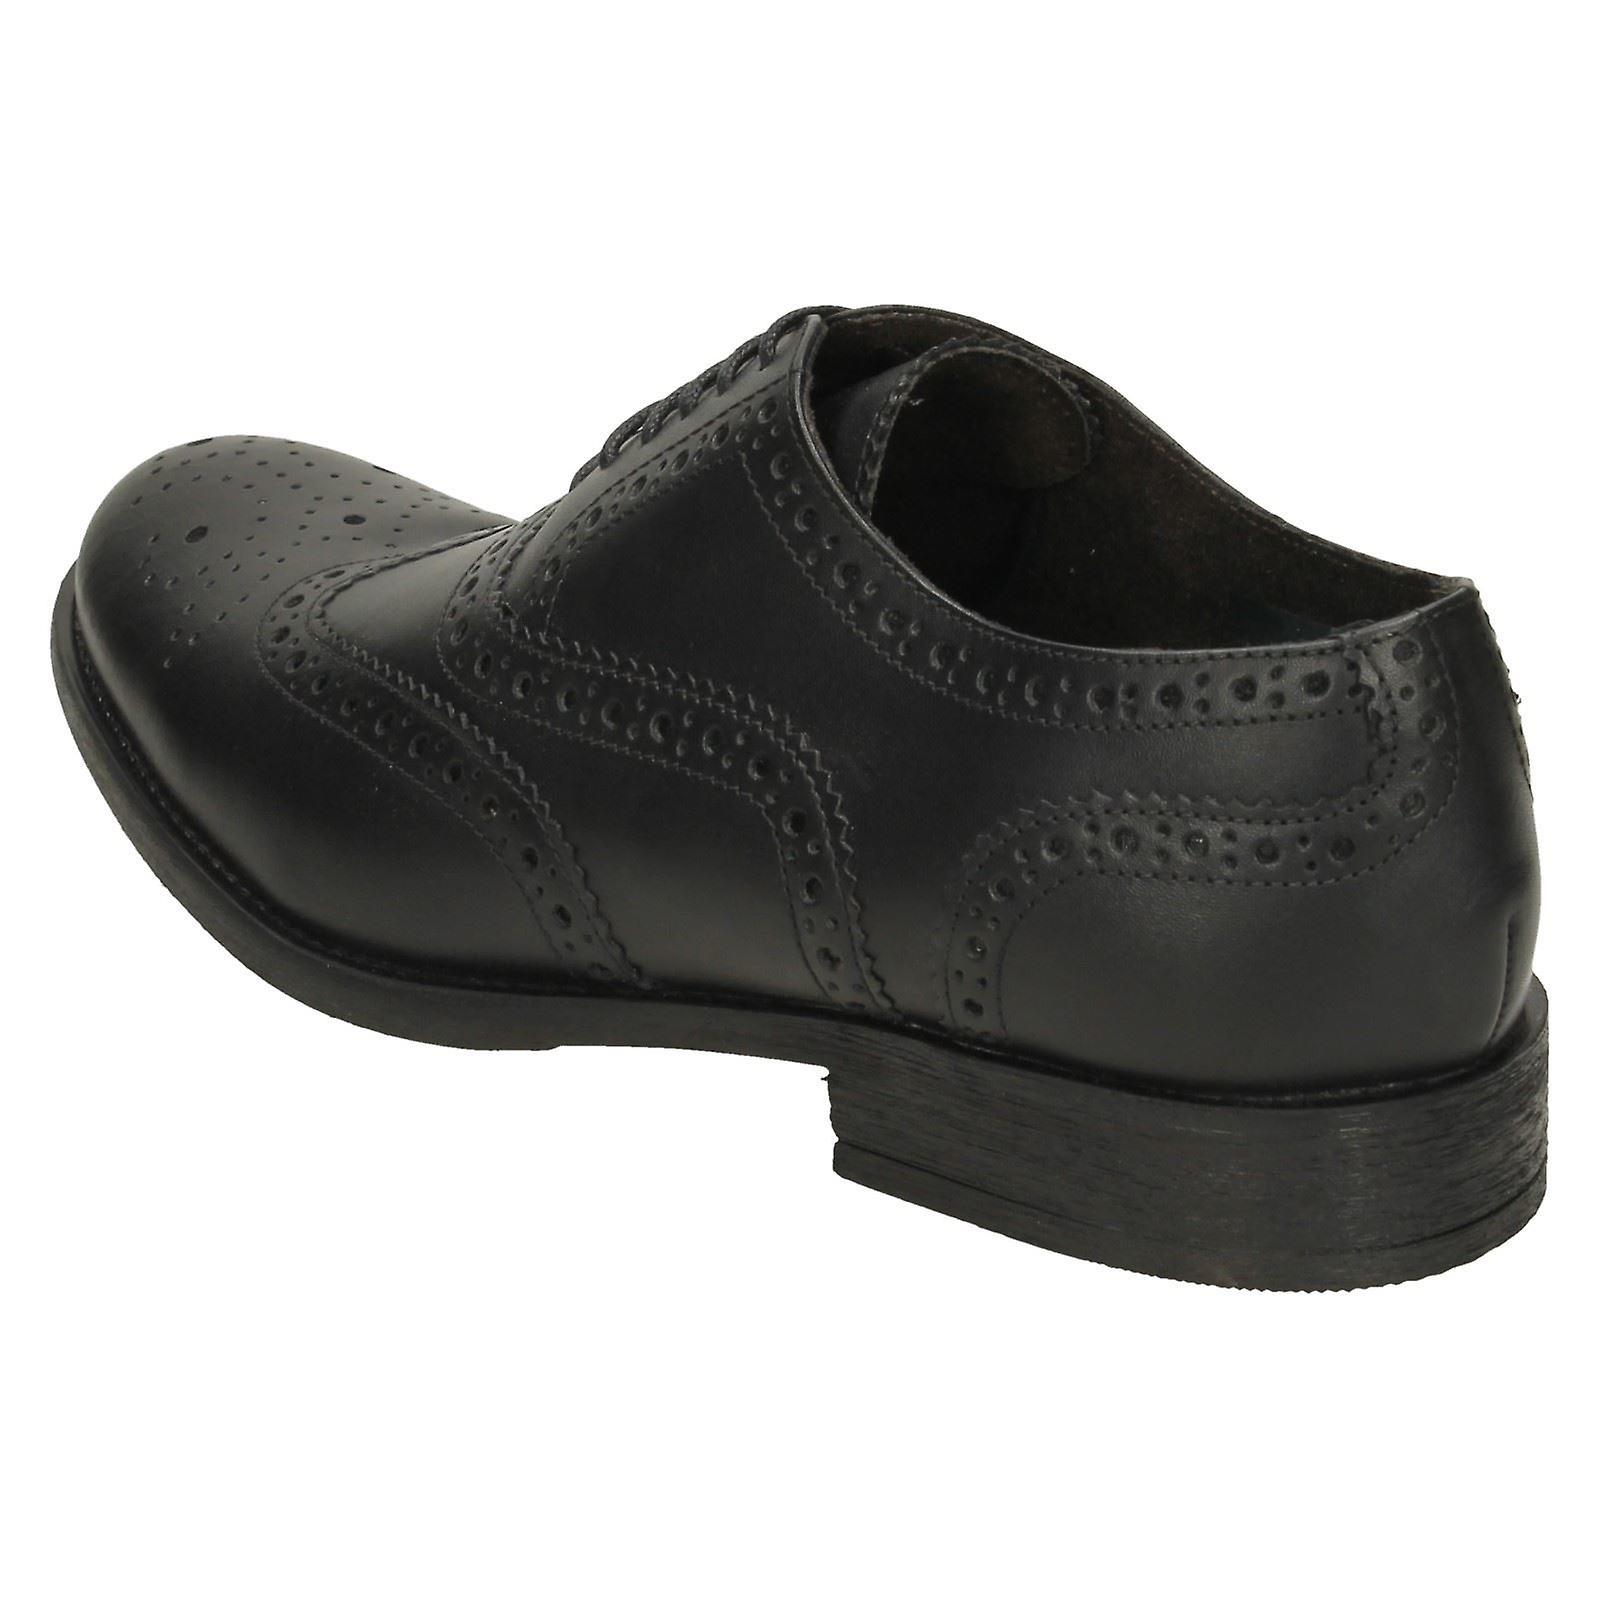 Shoes London Walnut Base MTO Mens Brogue qRwO0xf